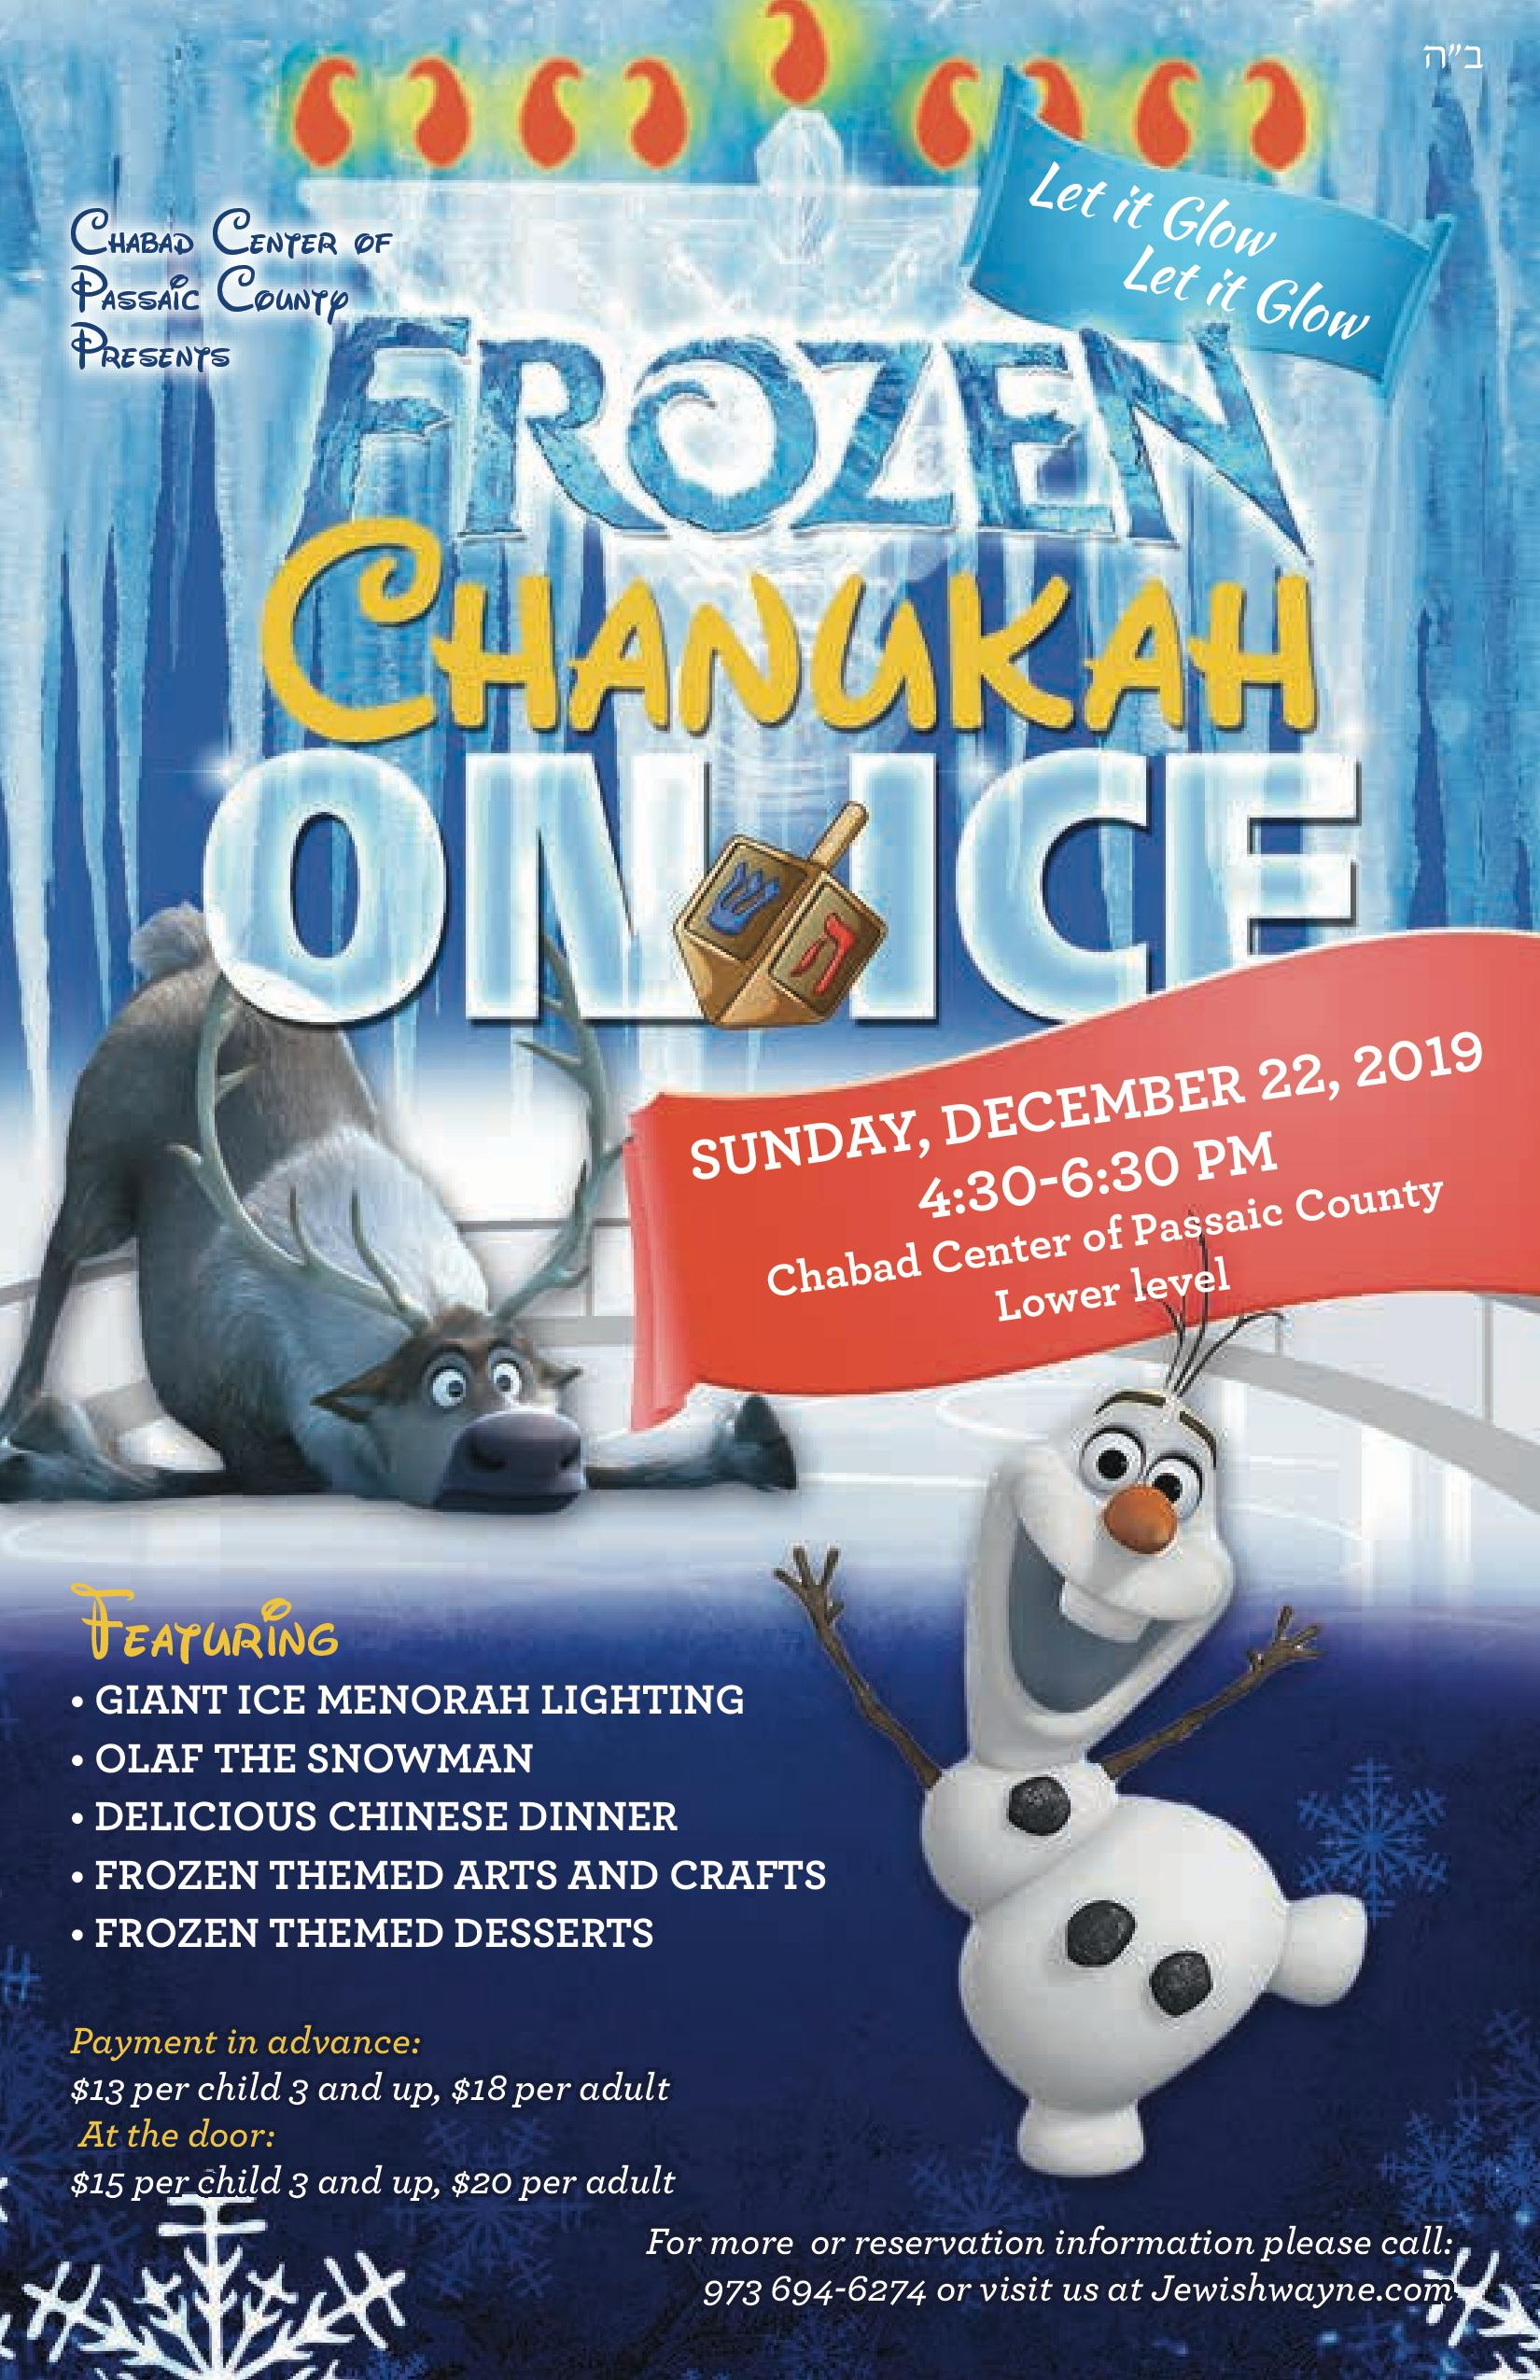 Frozen_chanukah-page-001.jpg